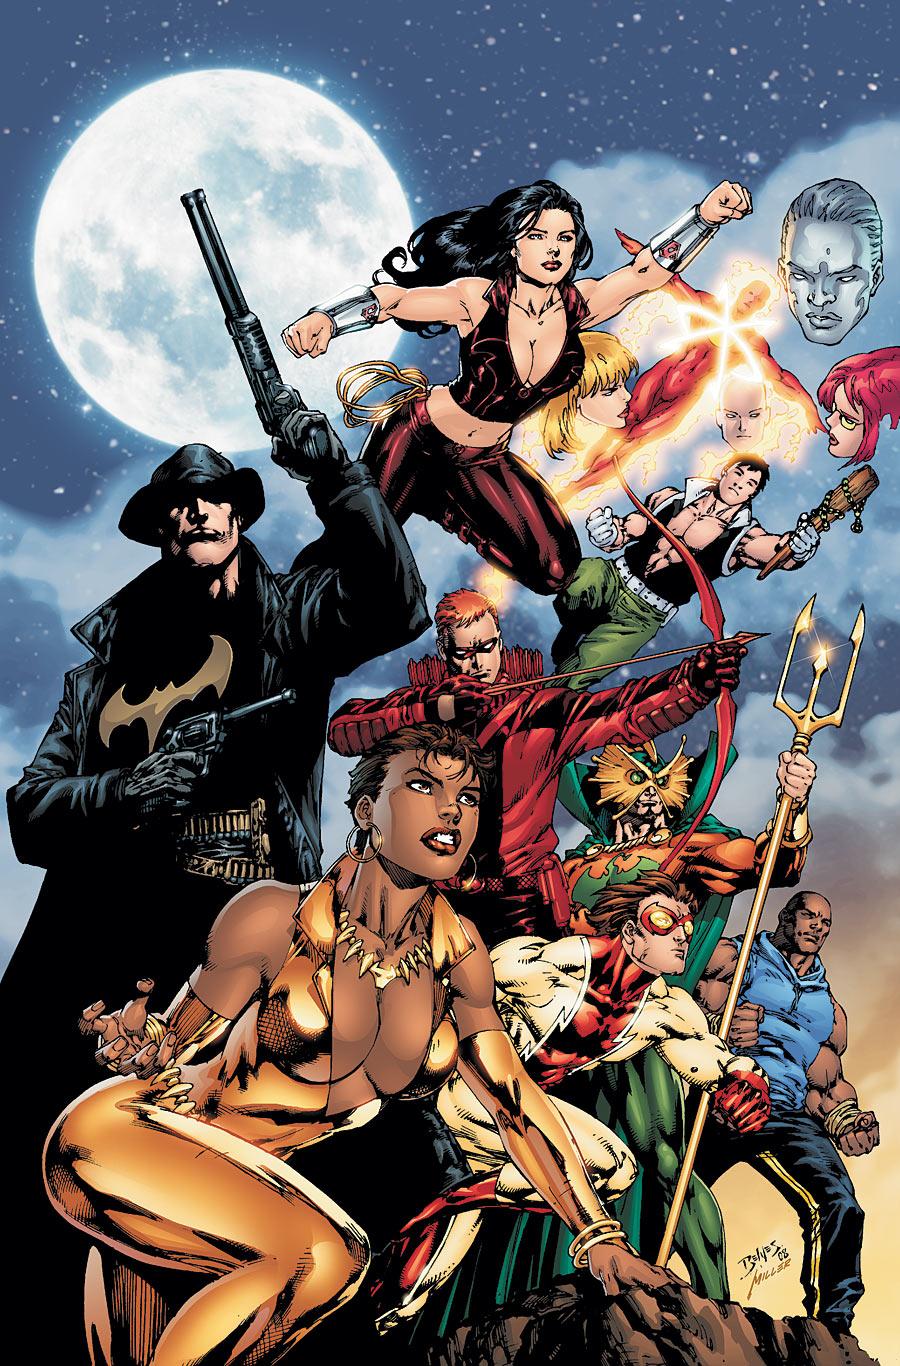 Justice League of America Vol 2 26 Textless.jpg